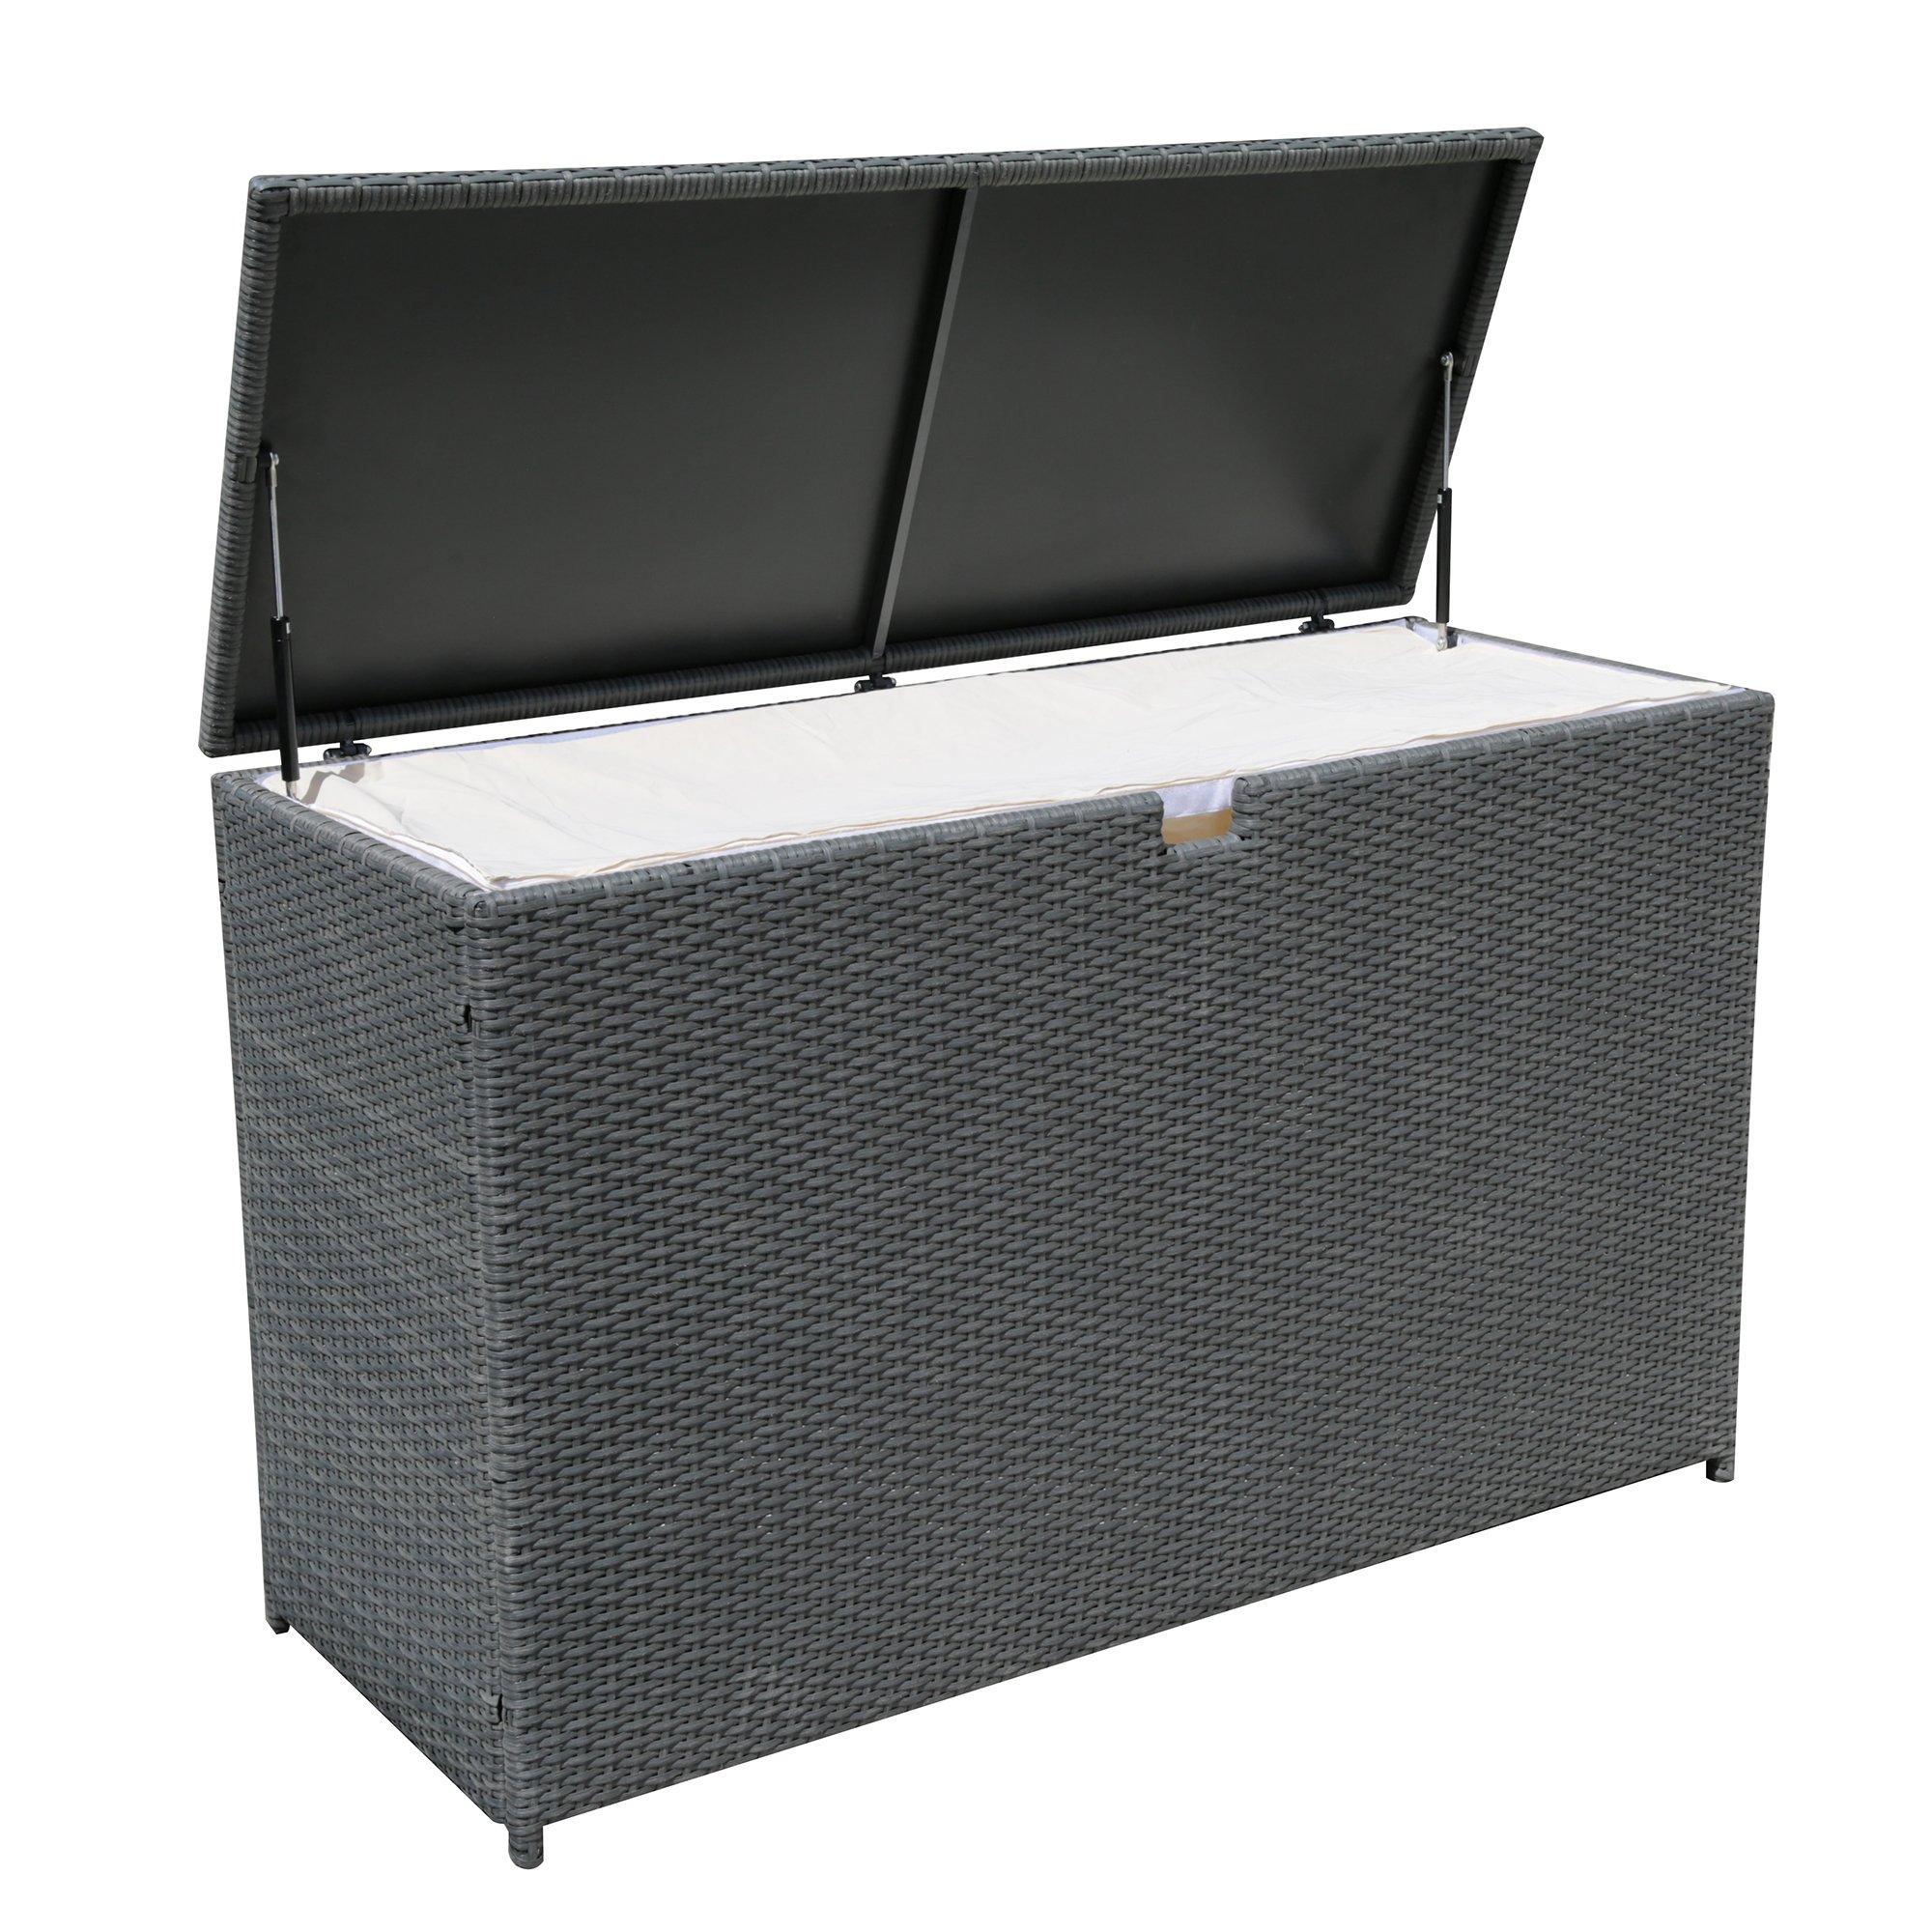 Merveilleux Get Quotations · PATIOROMA Outdoor Patio Aluminum Frame Wicker Cushion Storage  Bin Deck Box, Gray